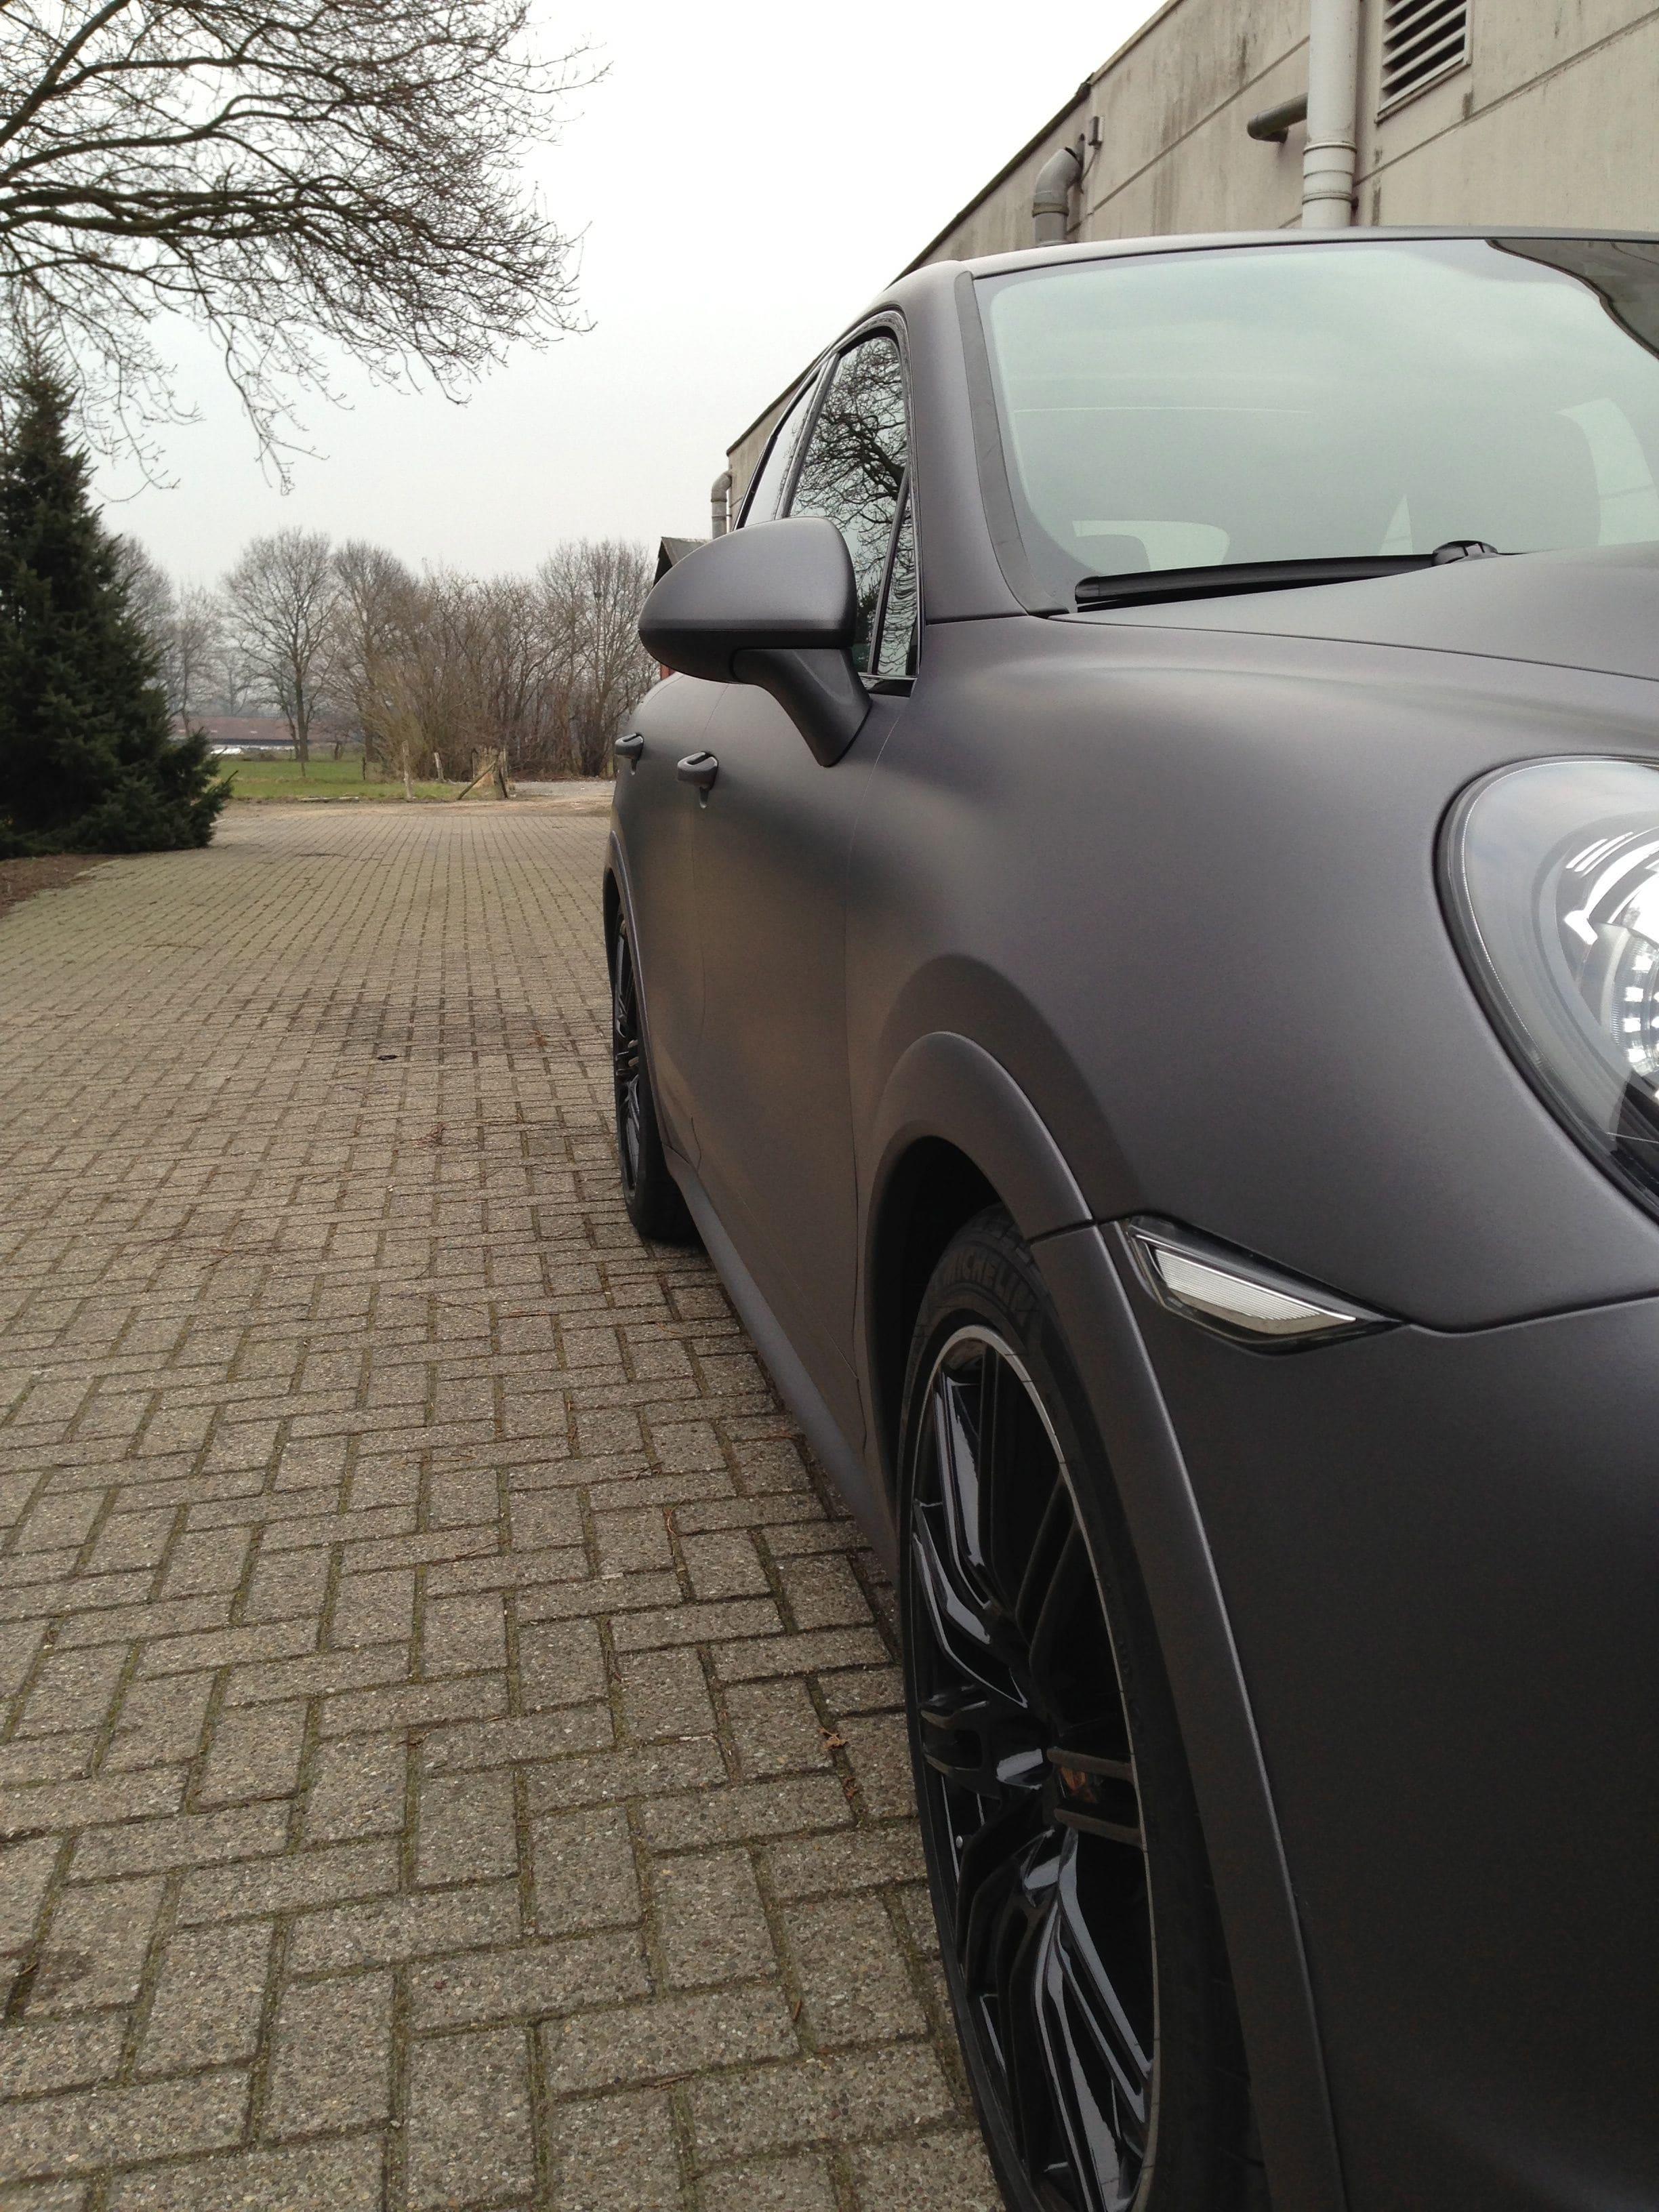 Porsche Cayenne GTS met Gunpowder Wrap, Carwrapping door Wrapmyride.nu Foto-nr:6771, ©2020